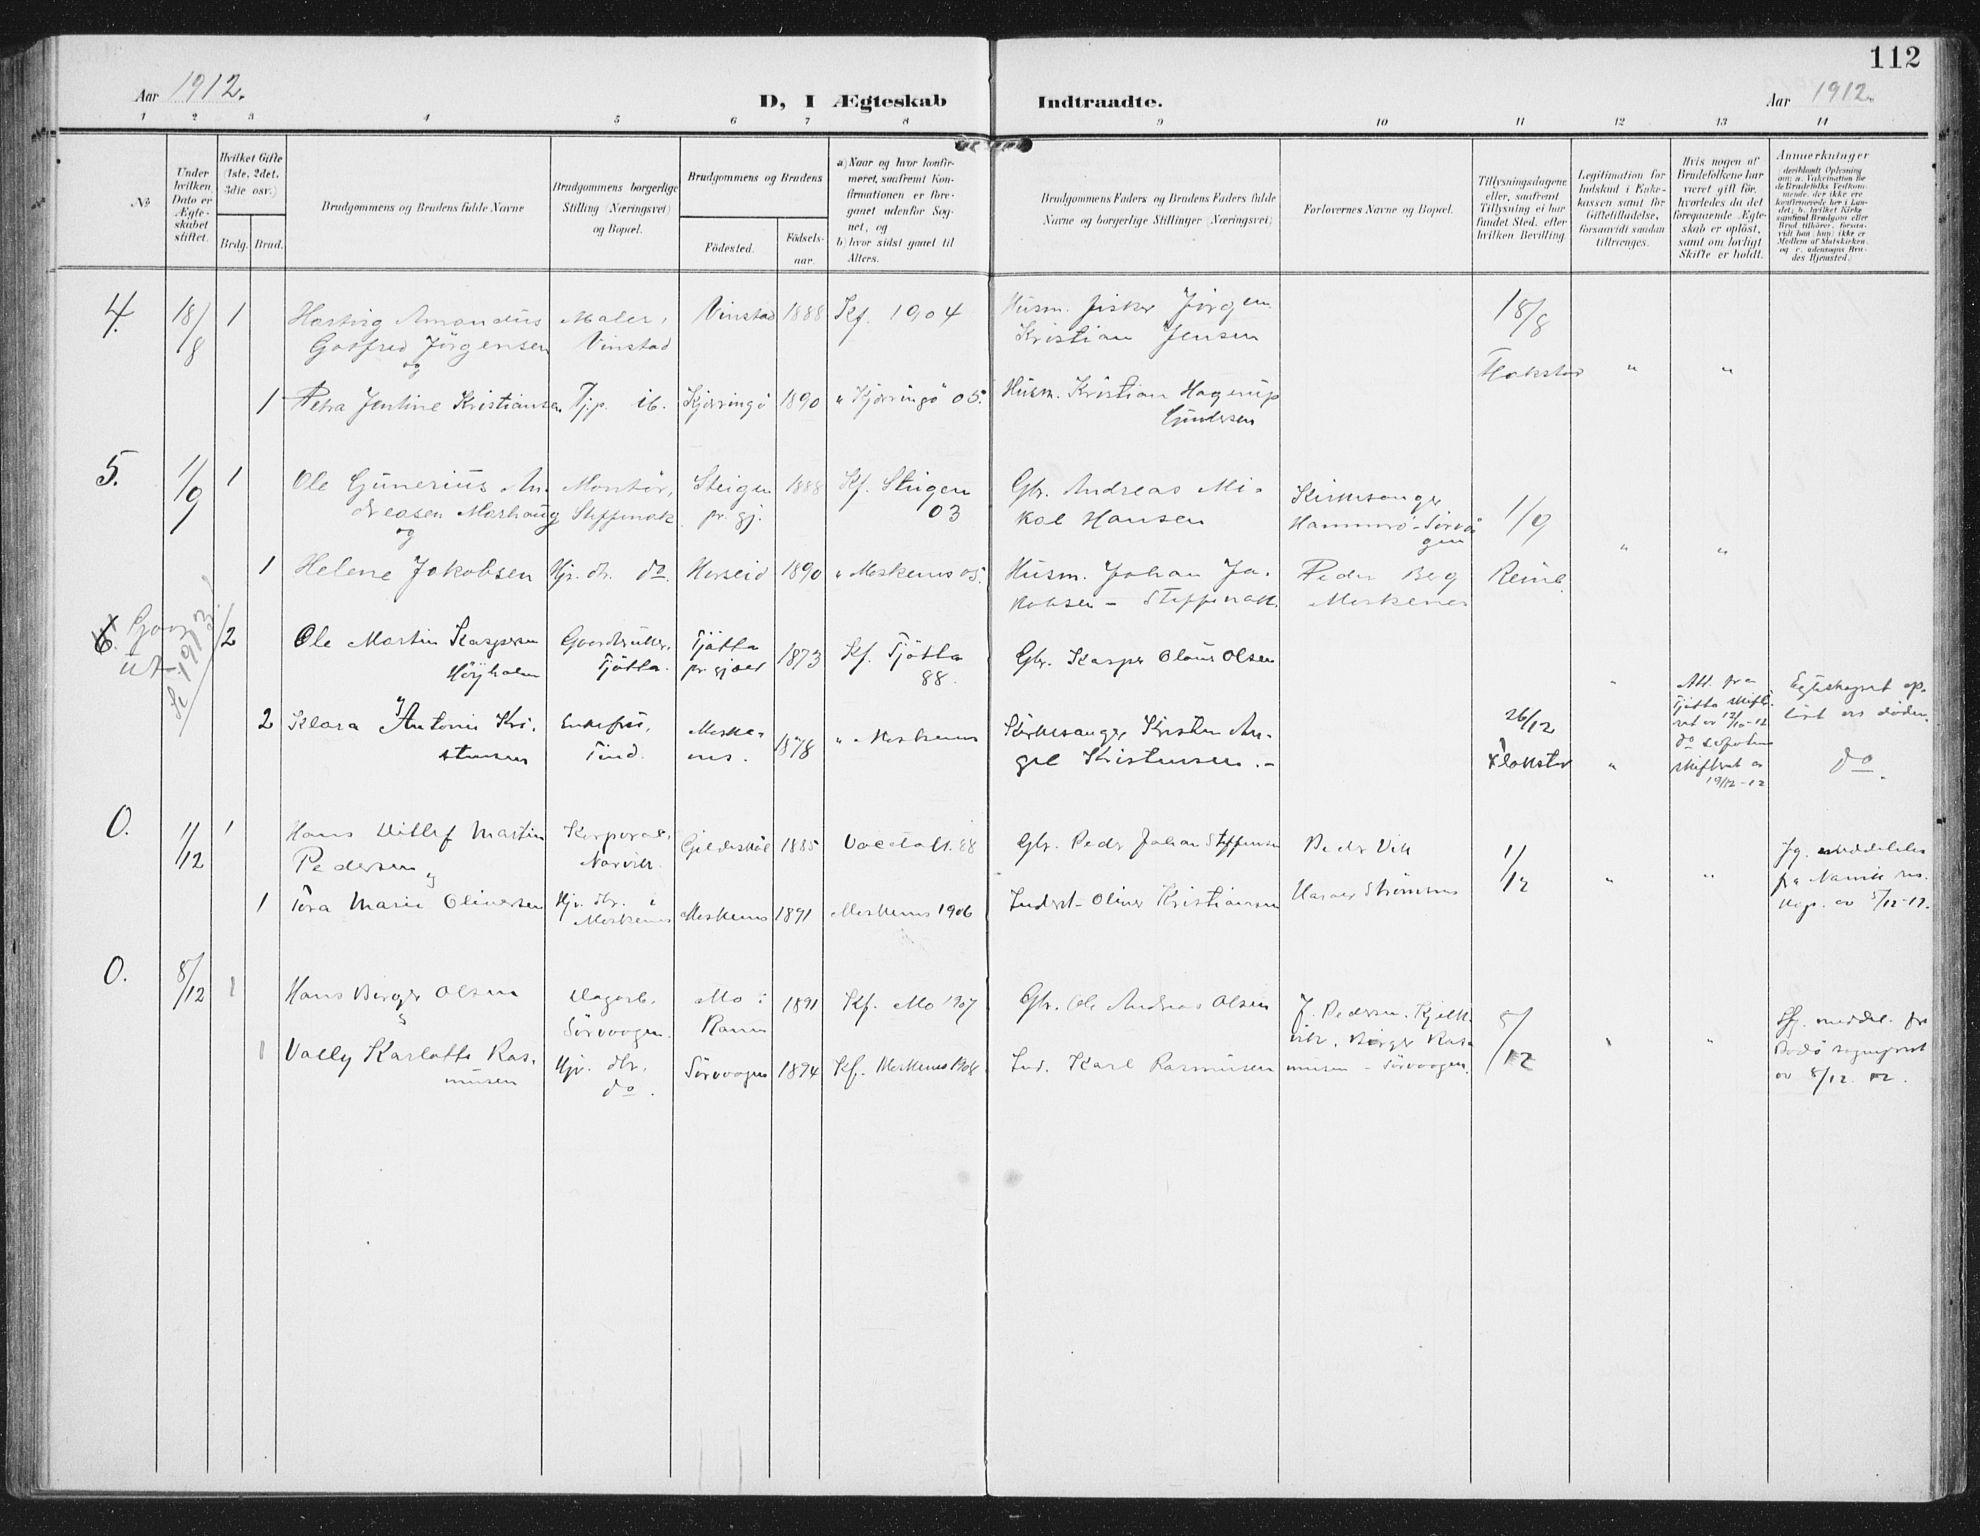 SAT, Ministerialprotokoller, klokkerbøker og fødselsregistre - Nordland, 886/L1221: Ministerialbok nr. 886A03, 1903-1913, s. 112